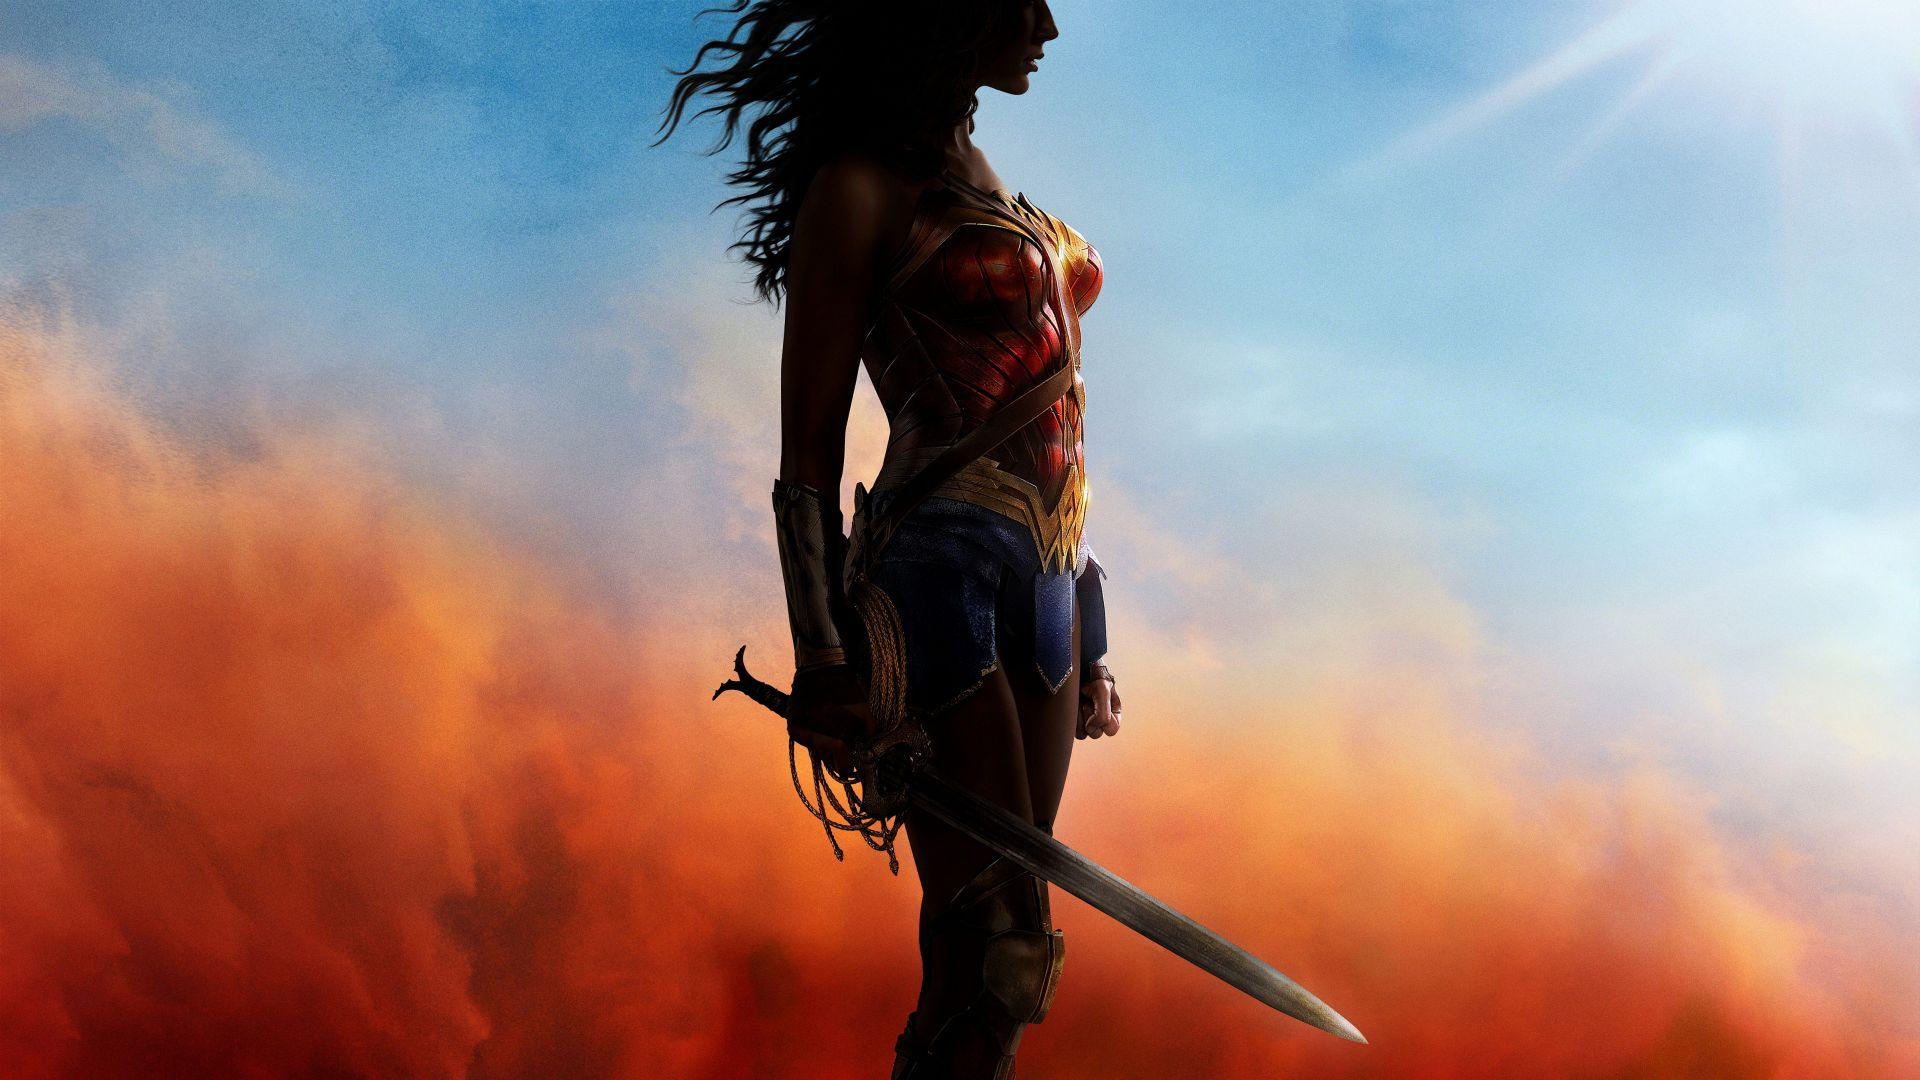 Wallpaper Wonder Woman 4k Gal Gadot Movies 11876